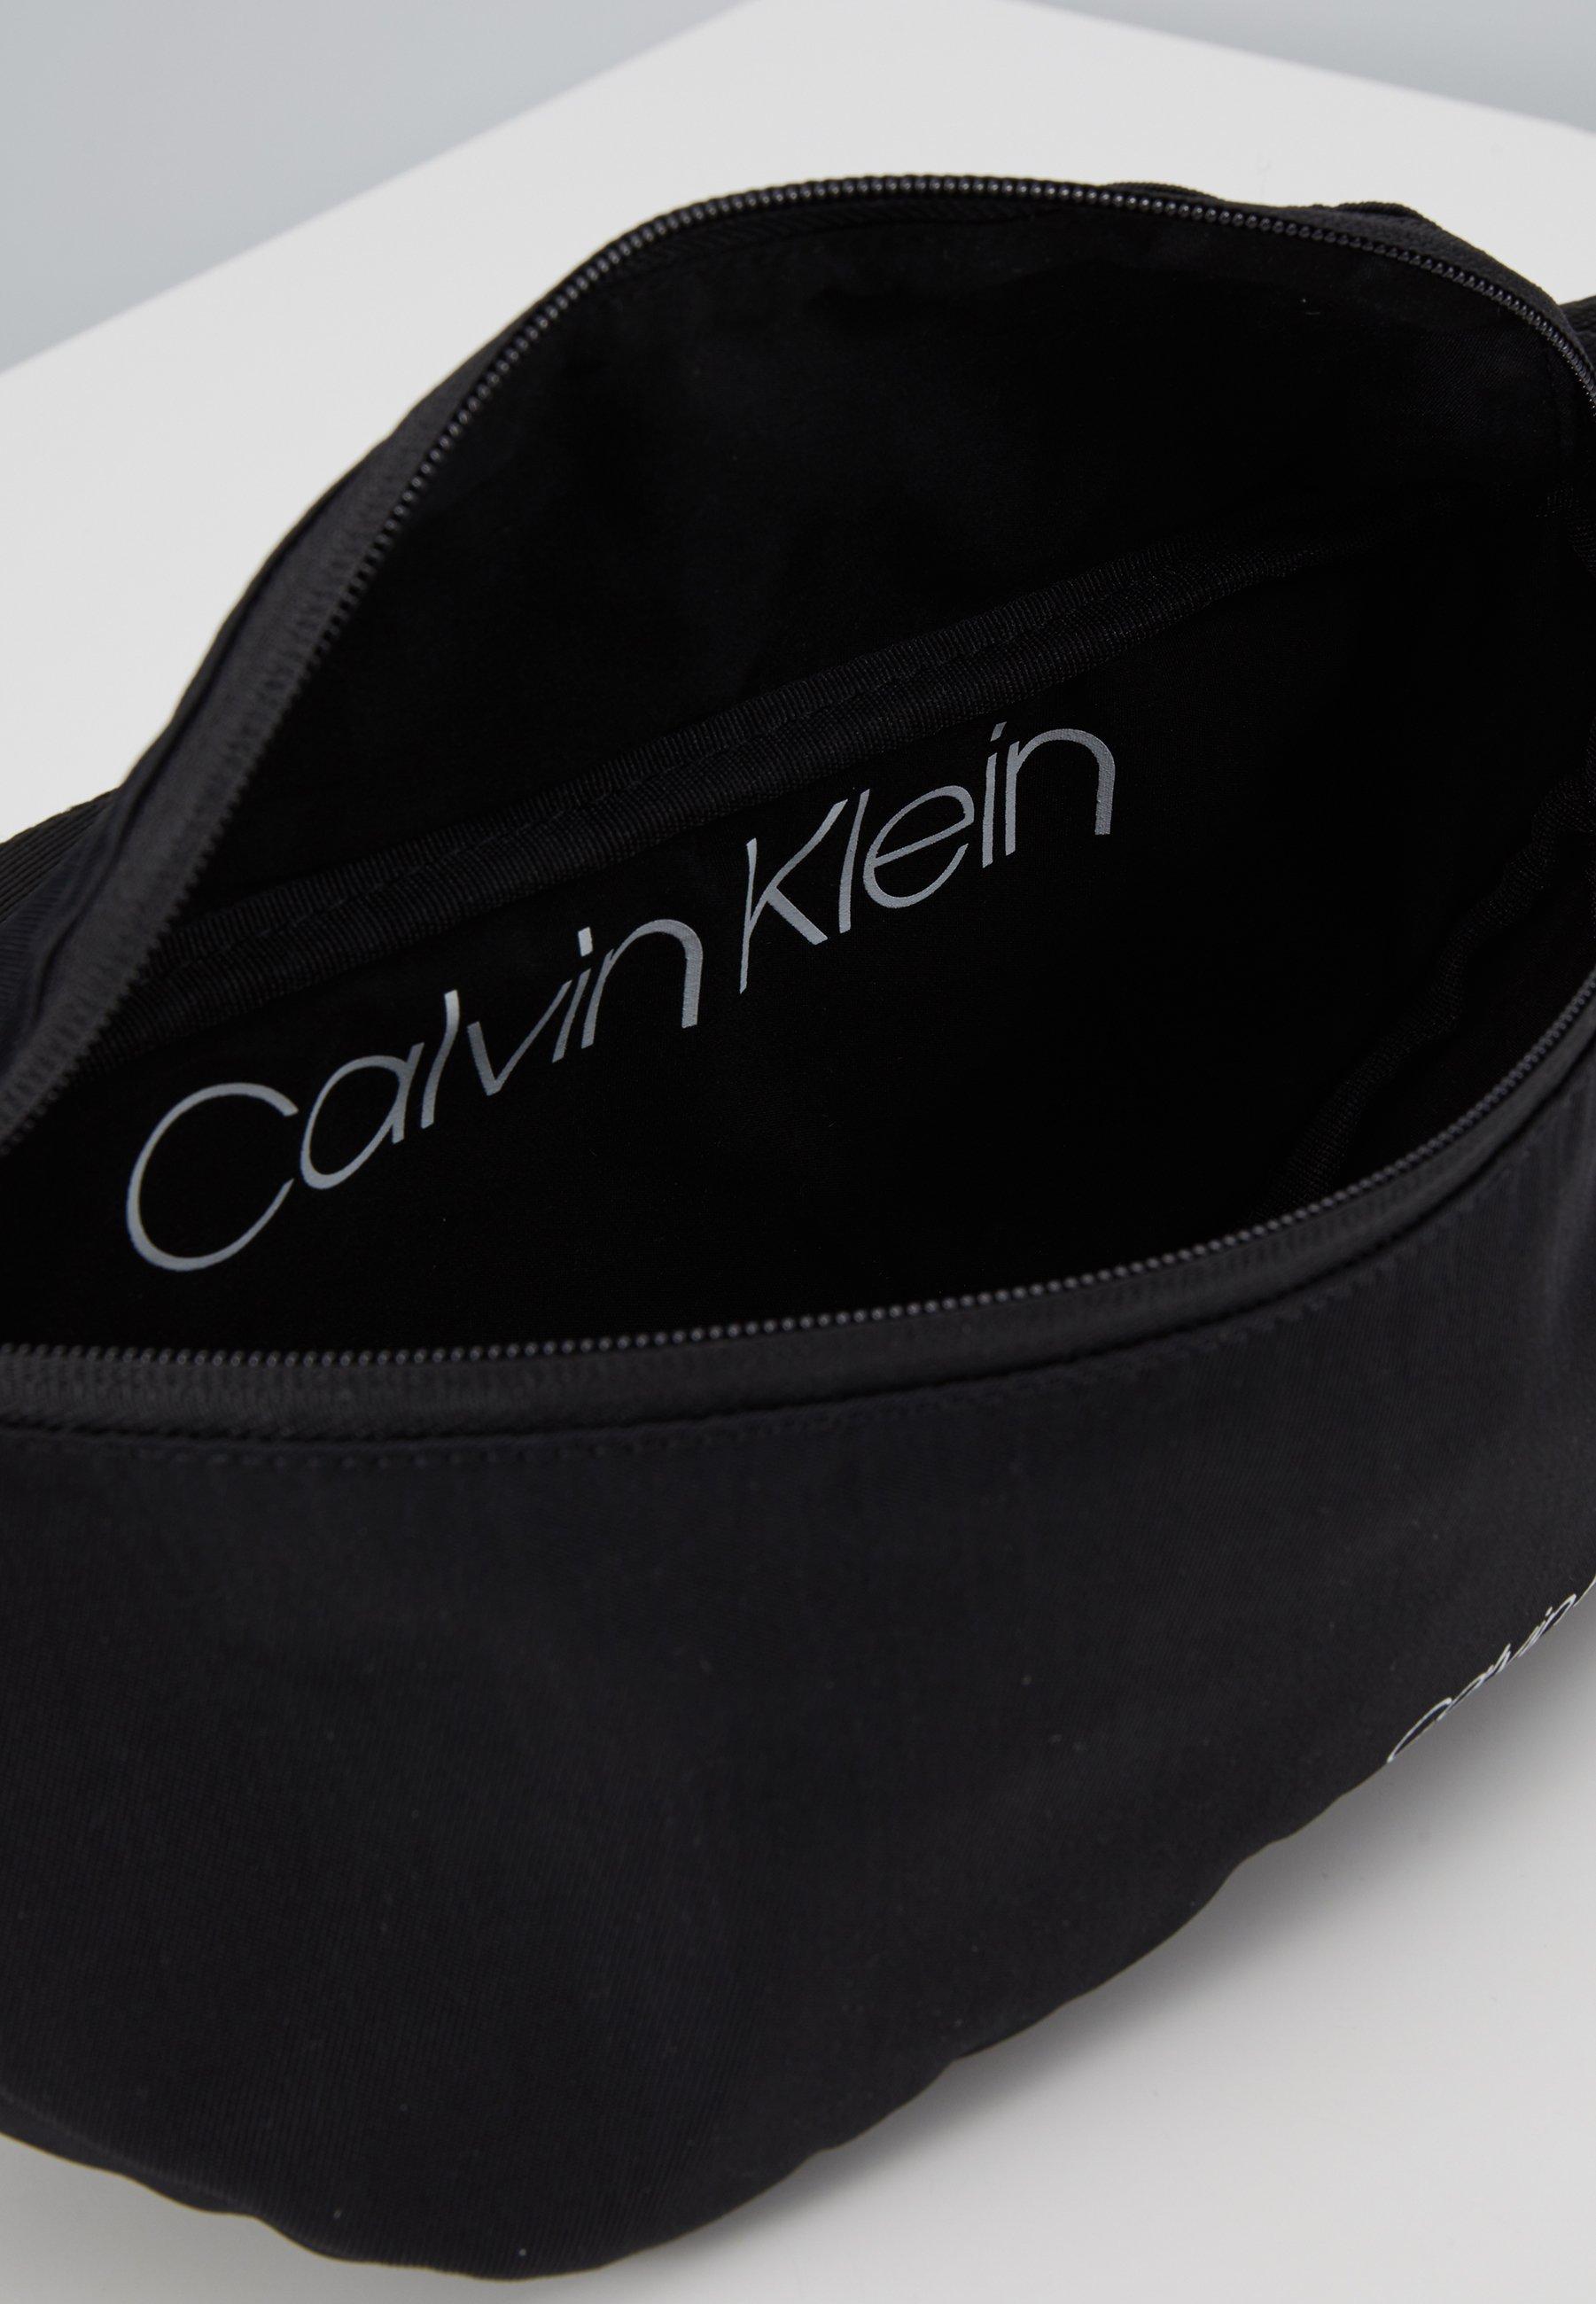 Calvin Klein Item Story Waistbag - Sac Banane Black